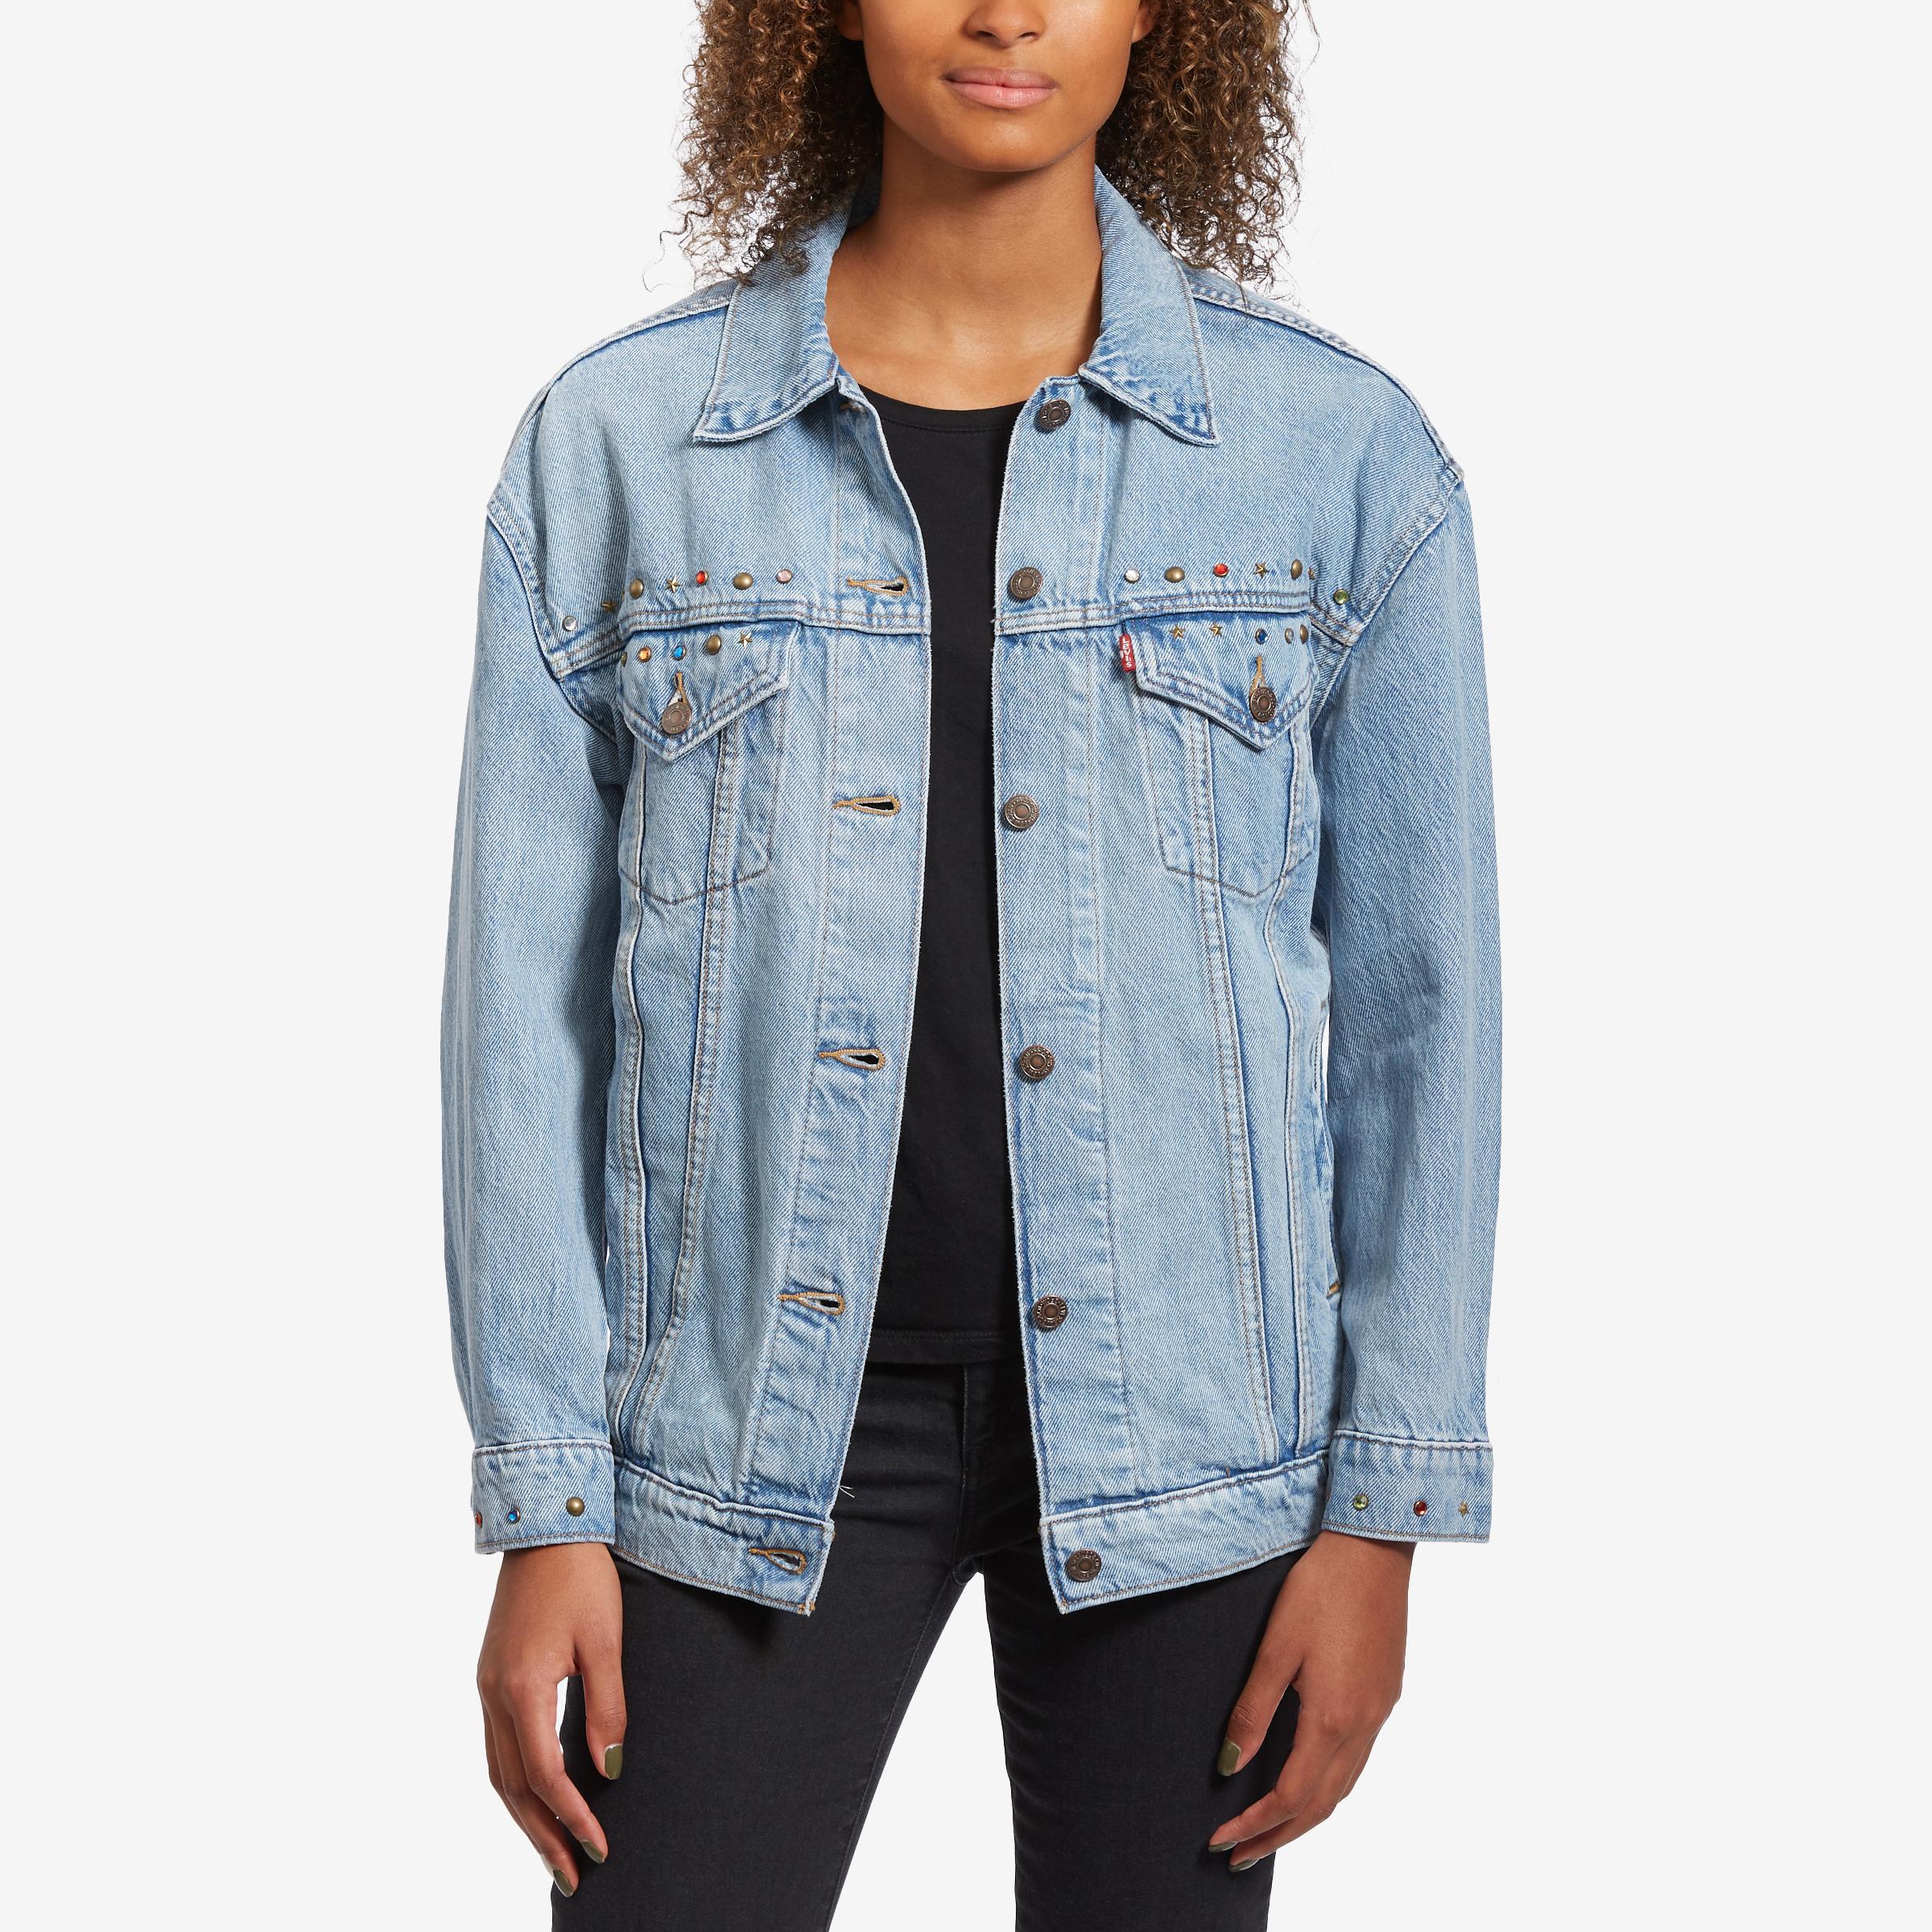 Women's Baggy Trucker Jacket